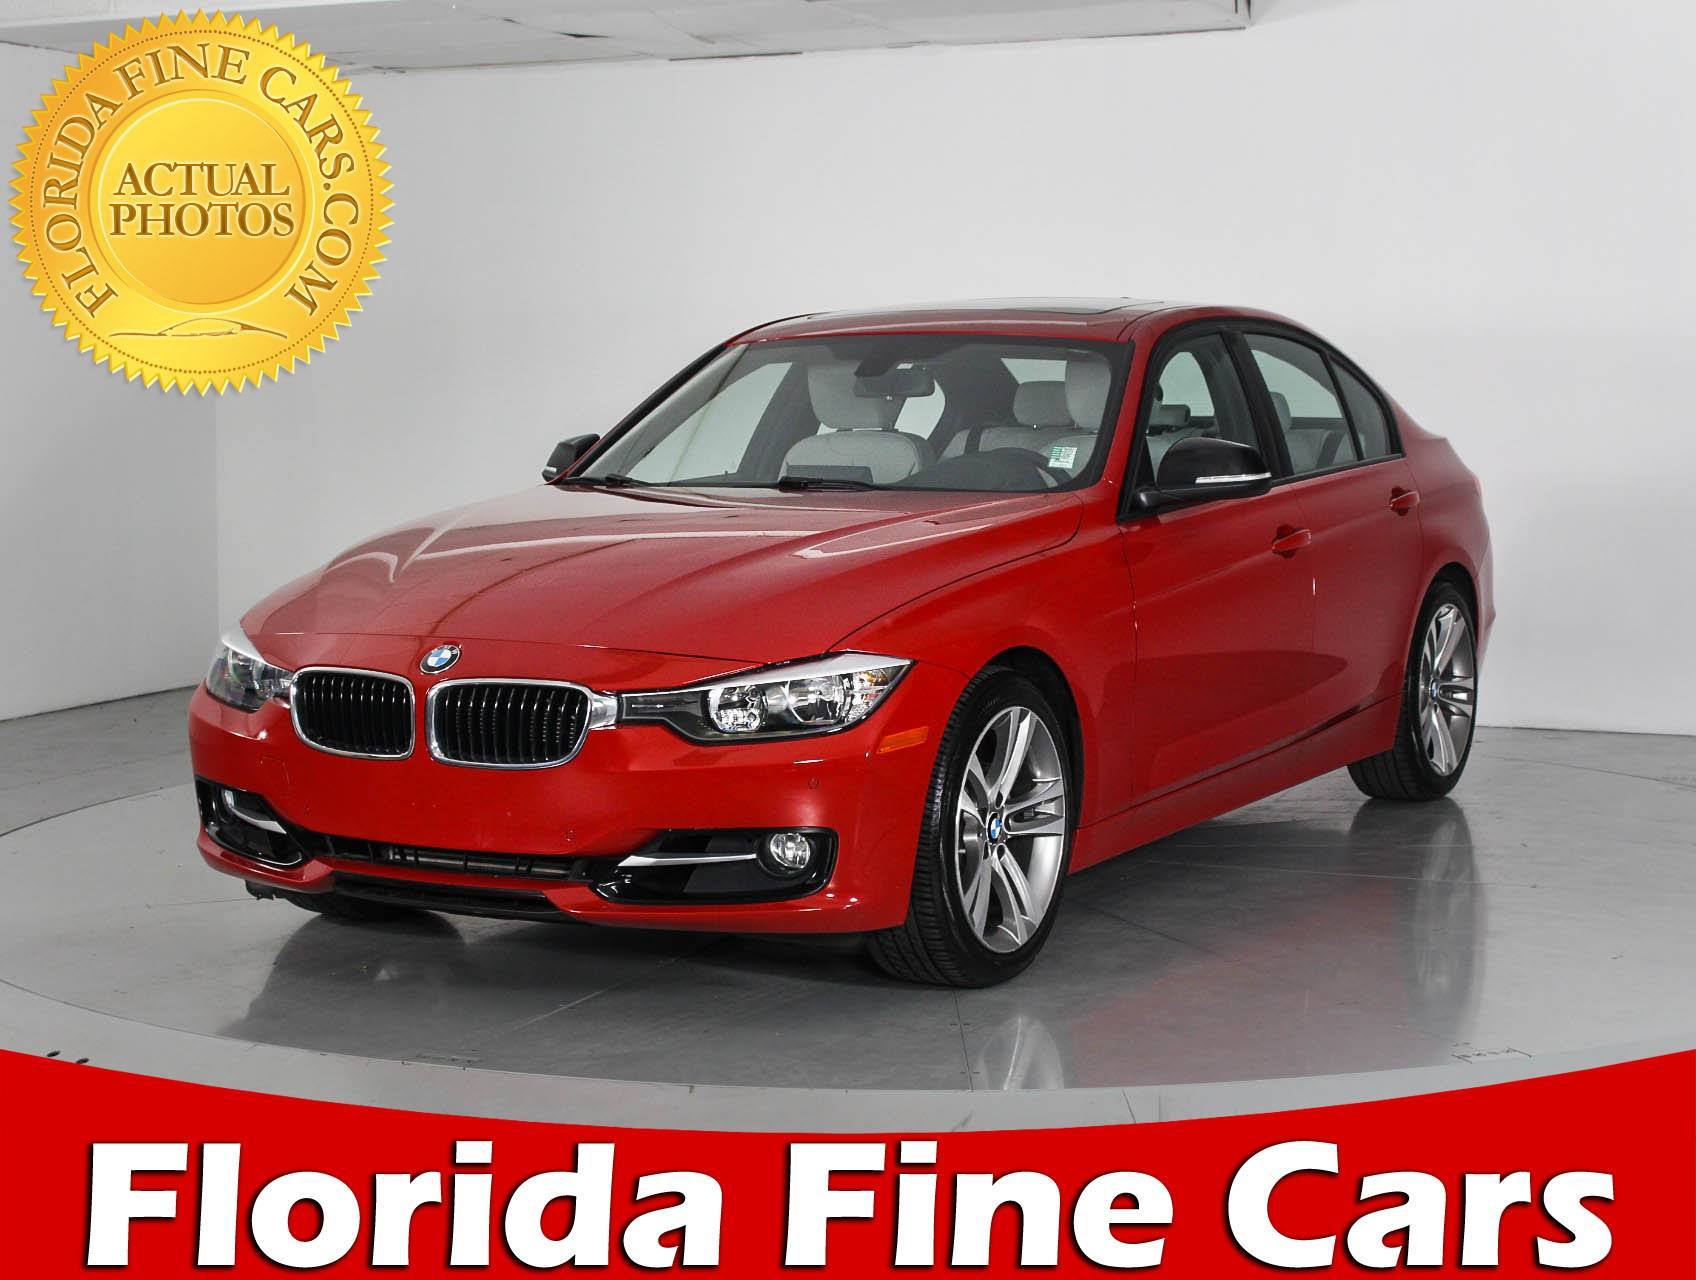 Used BMW SERIES I Sport Sedan For Sale In WEST PALM FL - Bmw 328i 2012 used